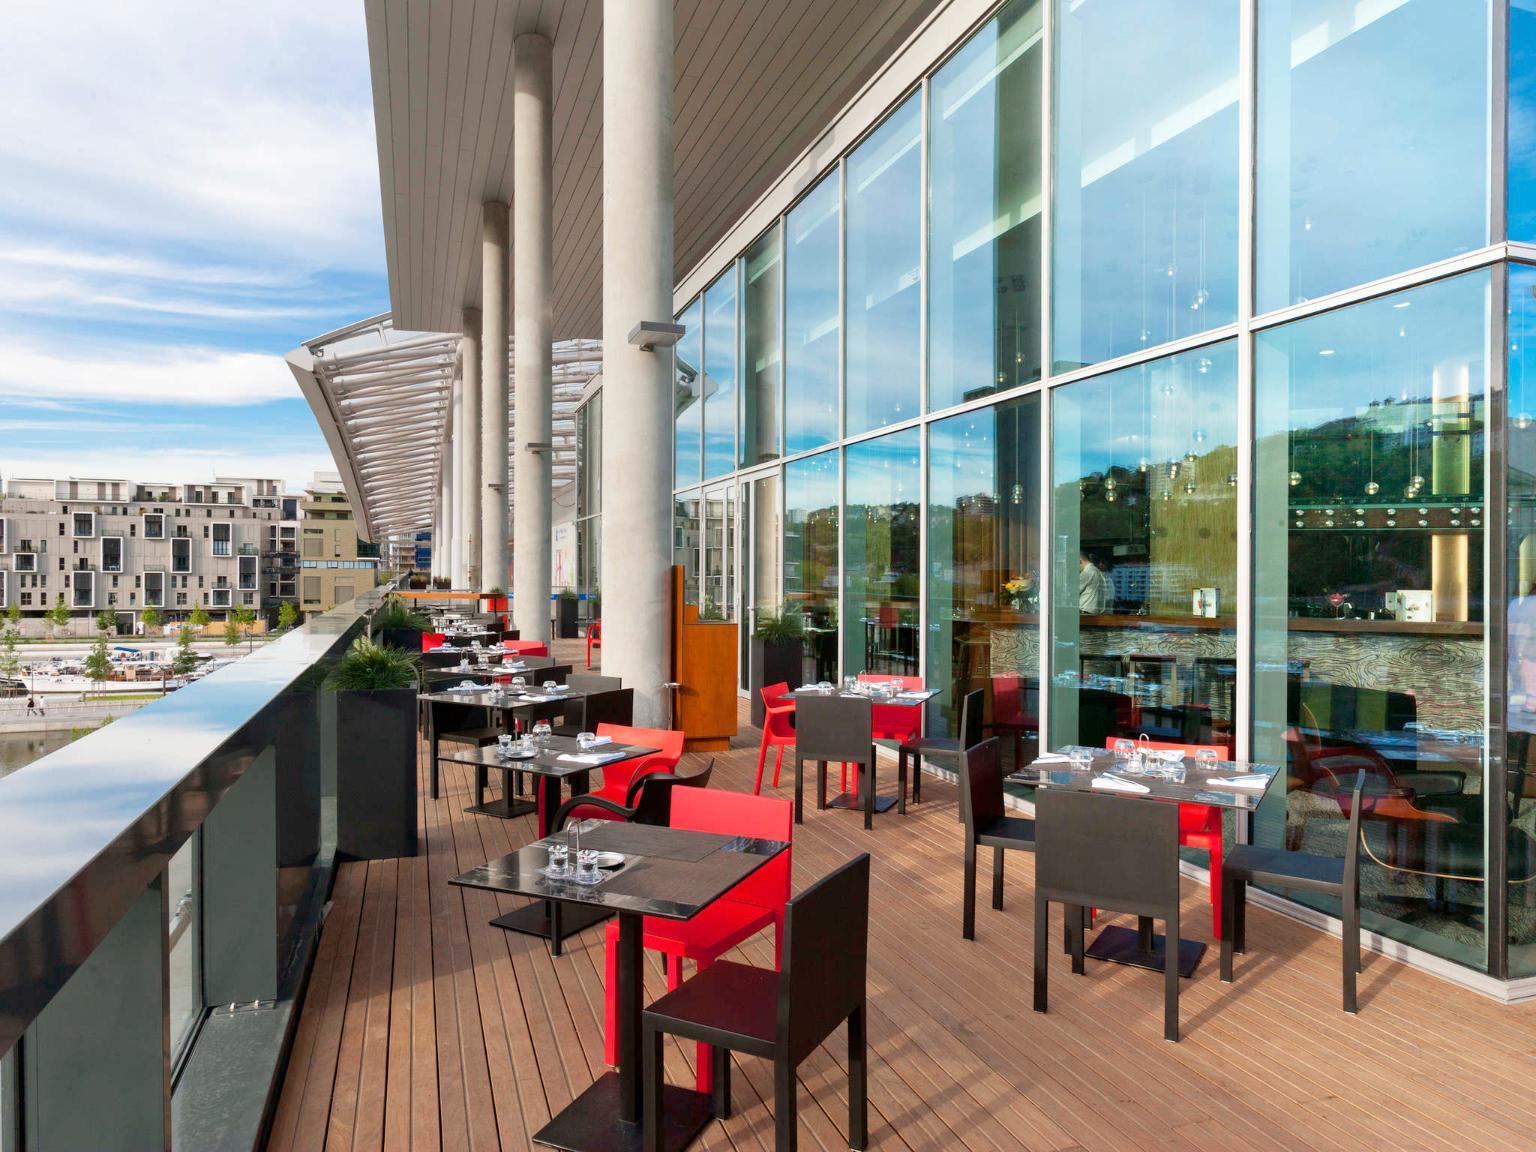 Novotel lyon confluence h tel 3 rue paul montrochet for Hotels 69002 lyon